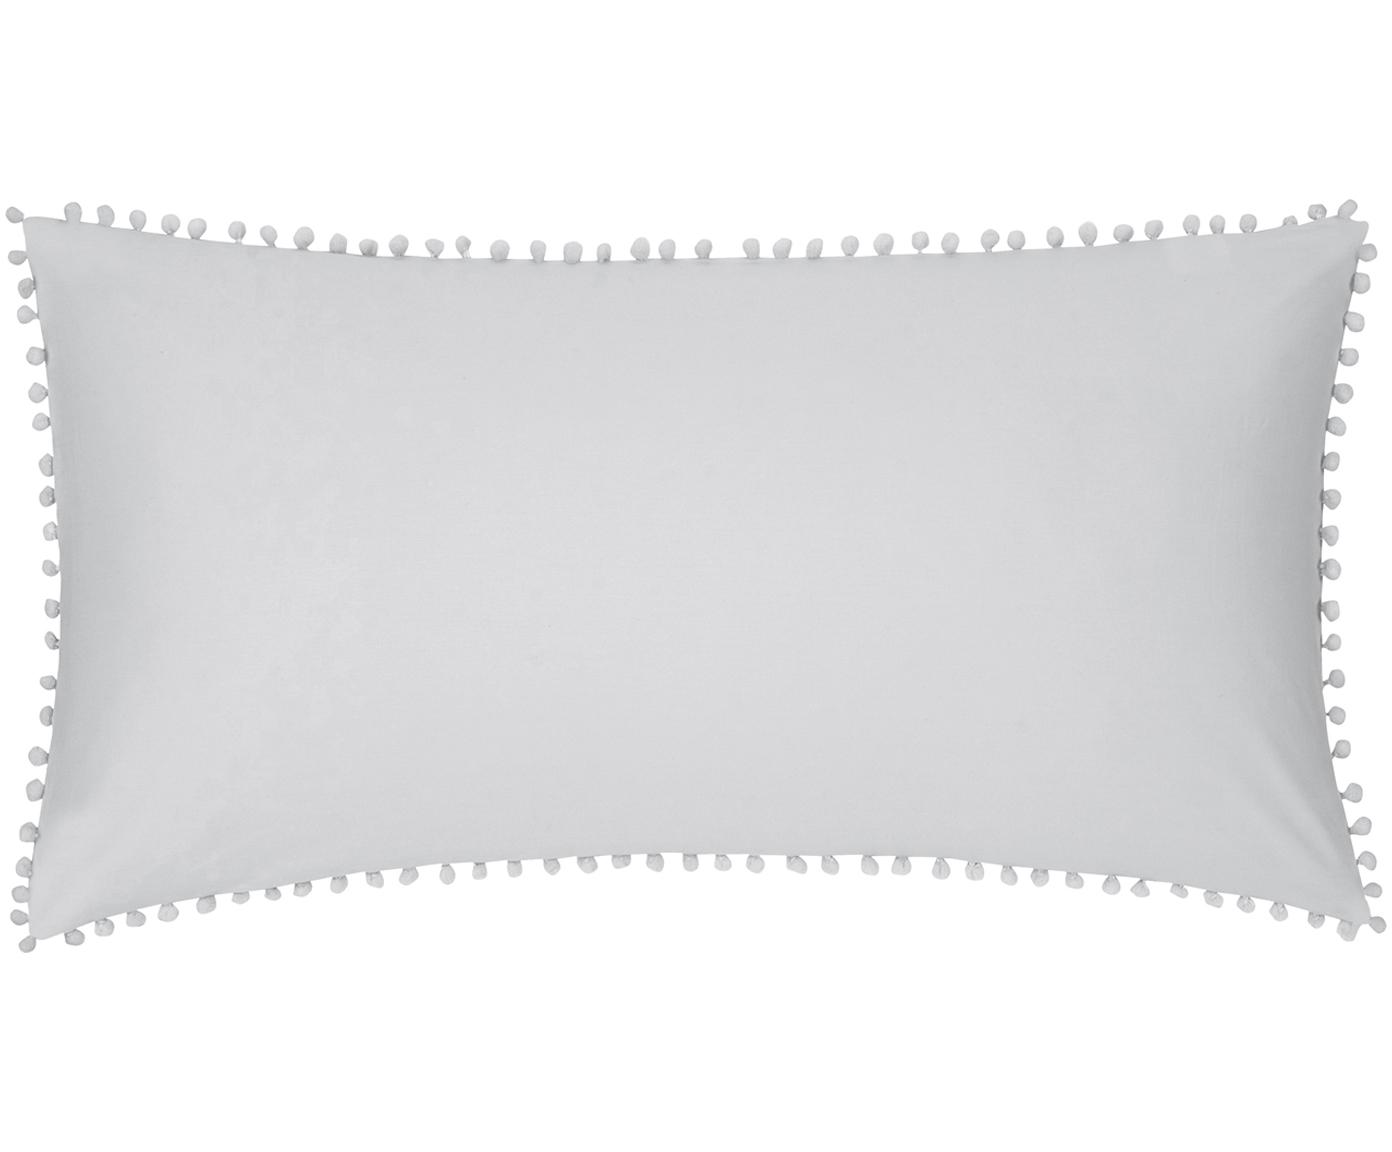 Baumwollperkal-Kissenbezüge Bommy mit Pompoms, 2 Stück, Webart: Perkal Fadendichte 200 TC, Hellgrau, 40 x 80 cm